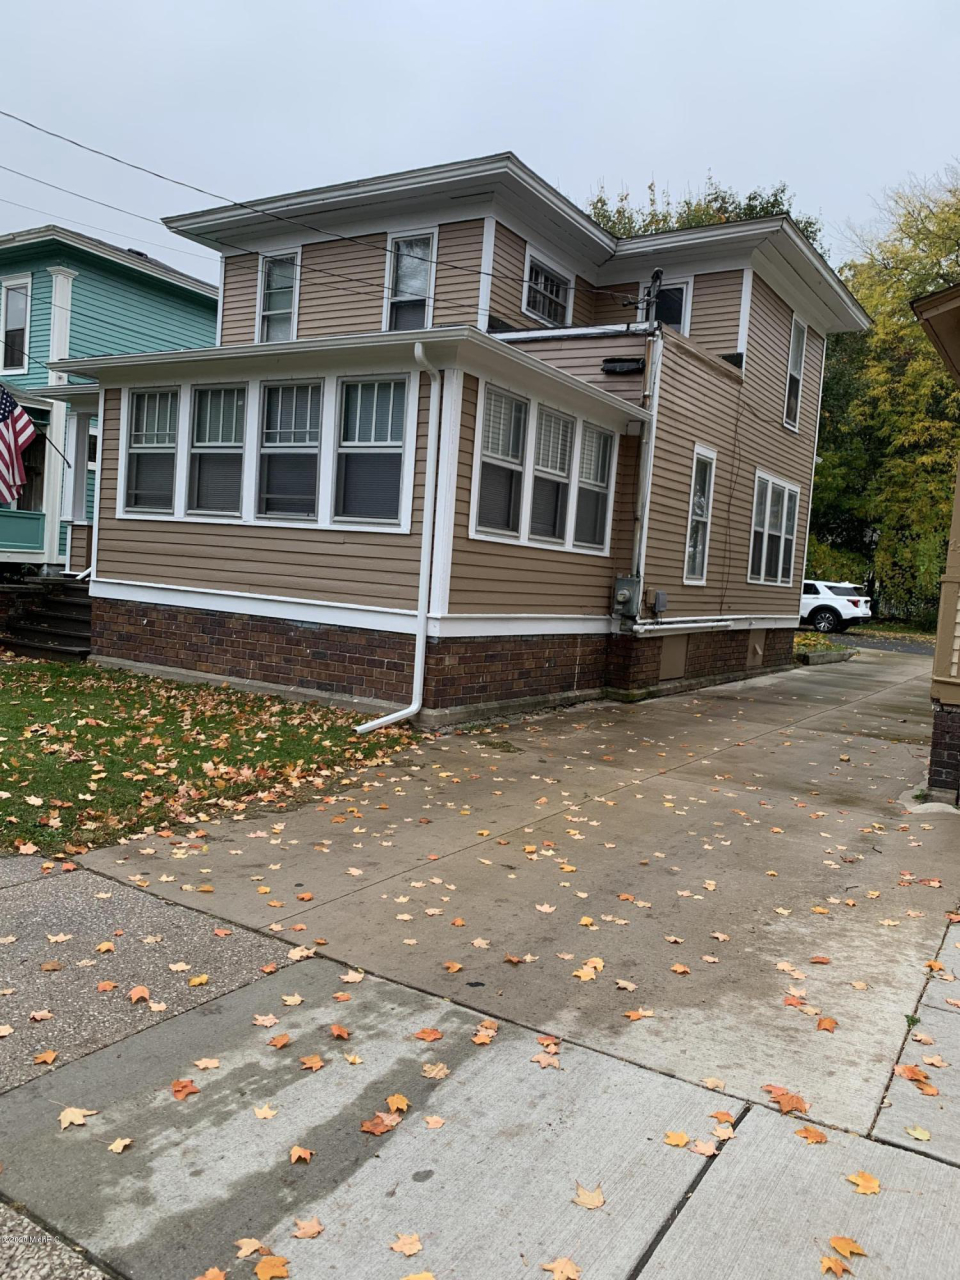 1106 S Park St Kalamazoo, MI 49001